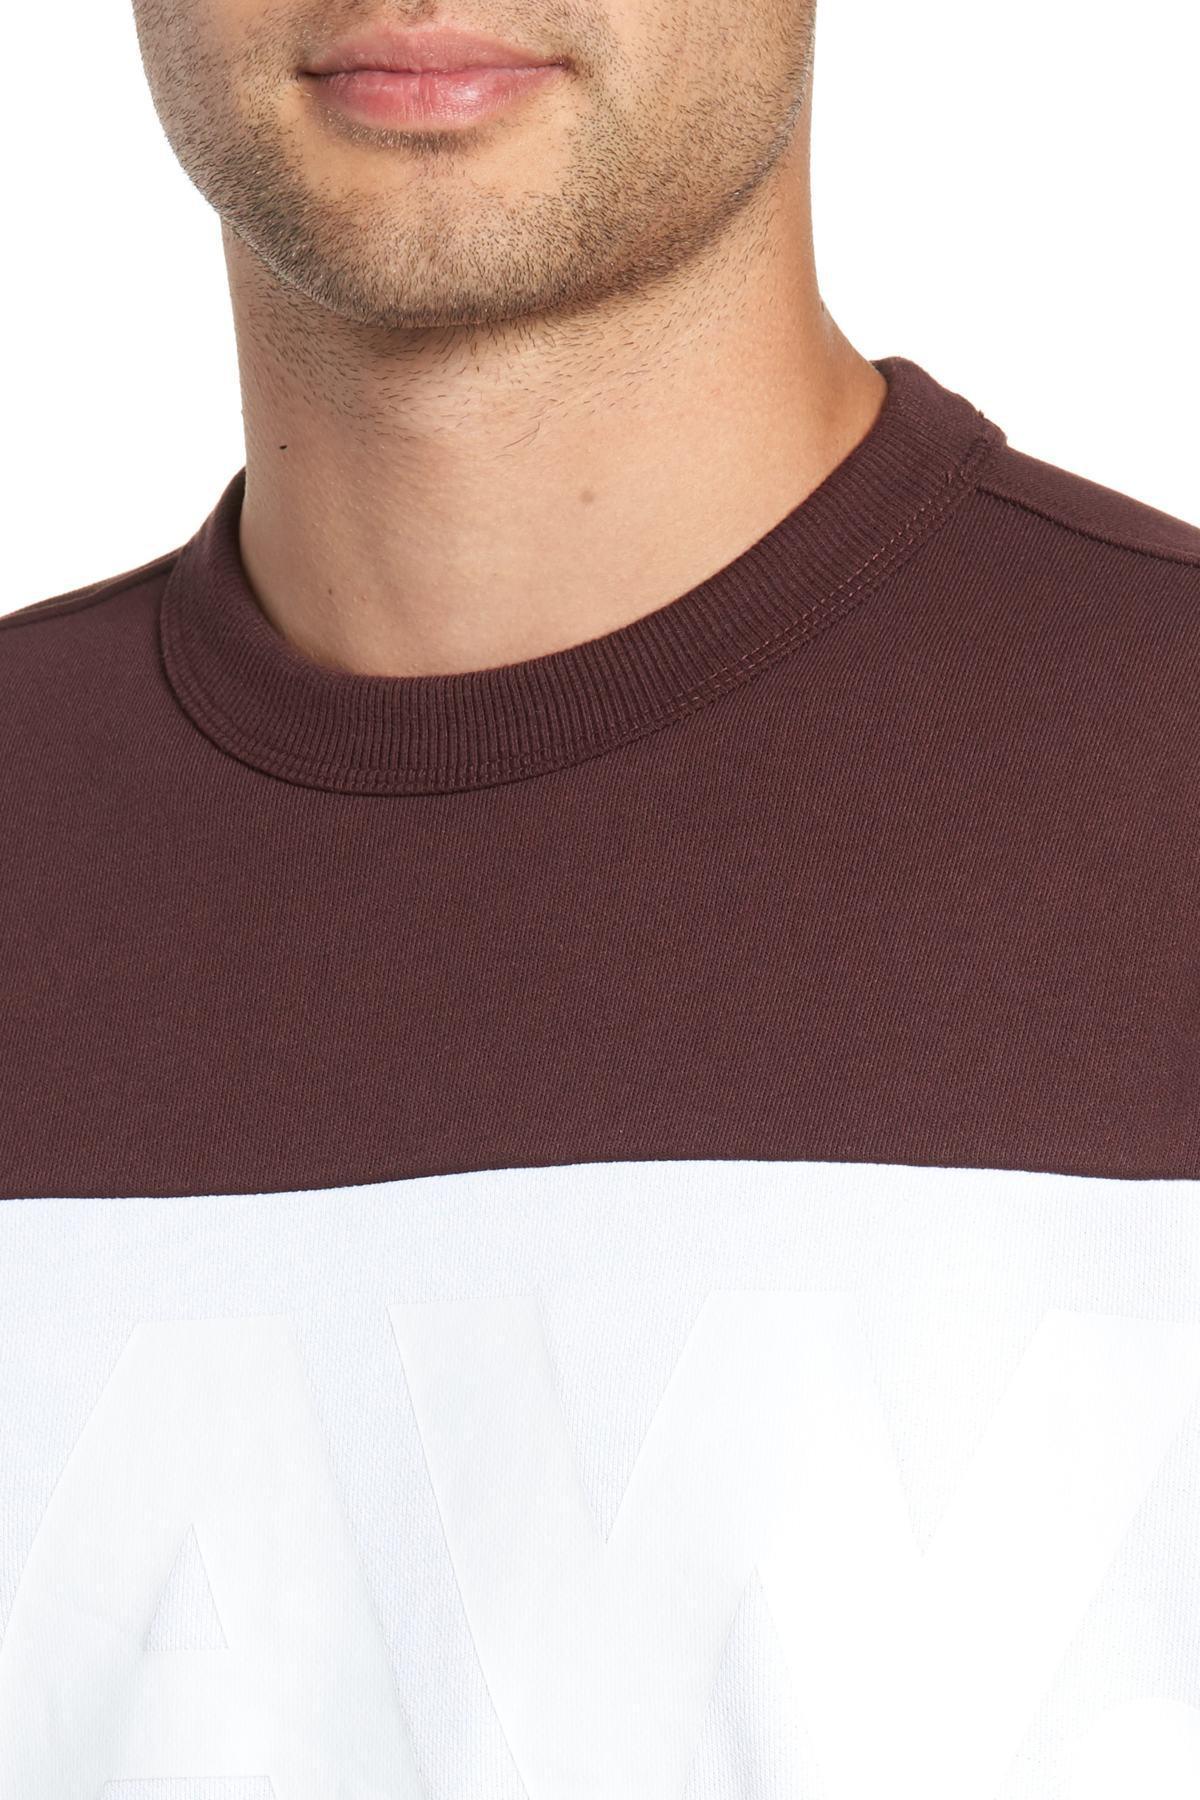 G-Star Mens Libe Core Colorblock Crewneck Sweatshirt